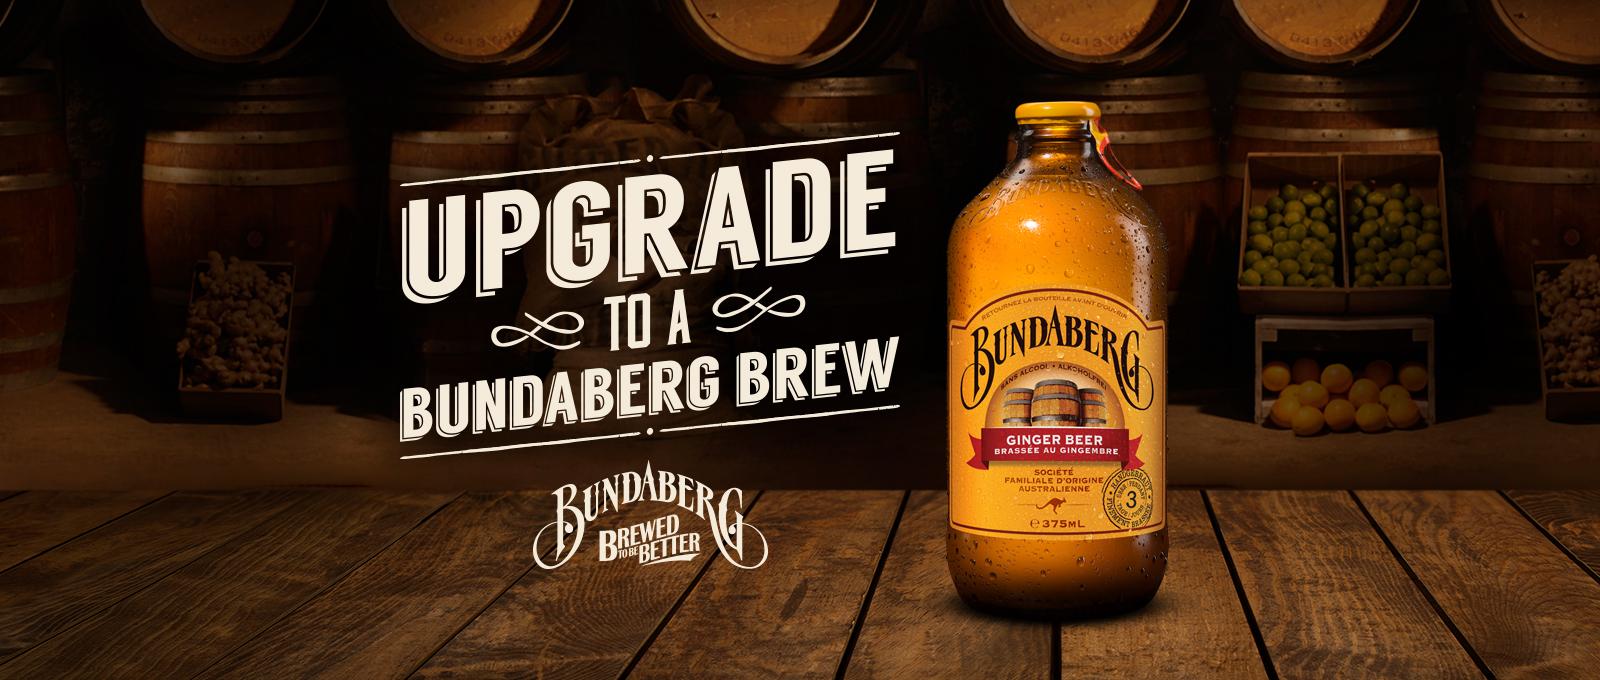 Upgrade to a Bundaberg Brew